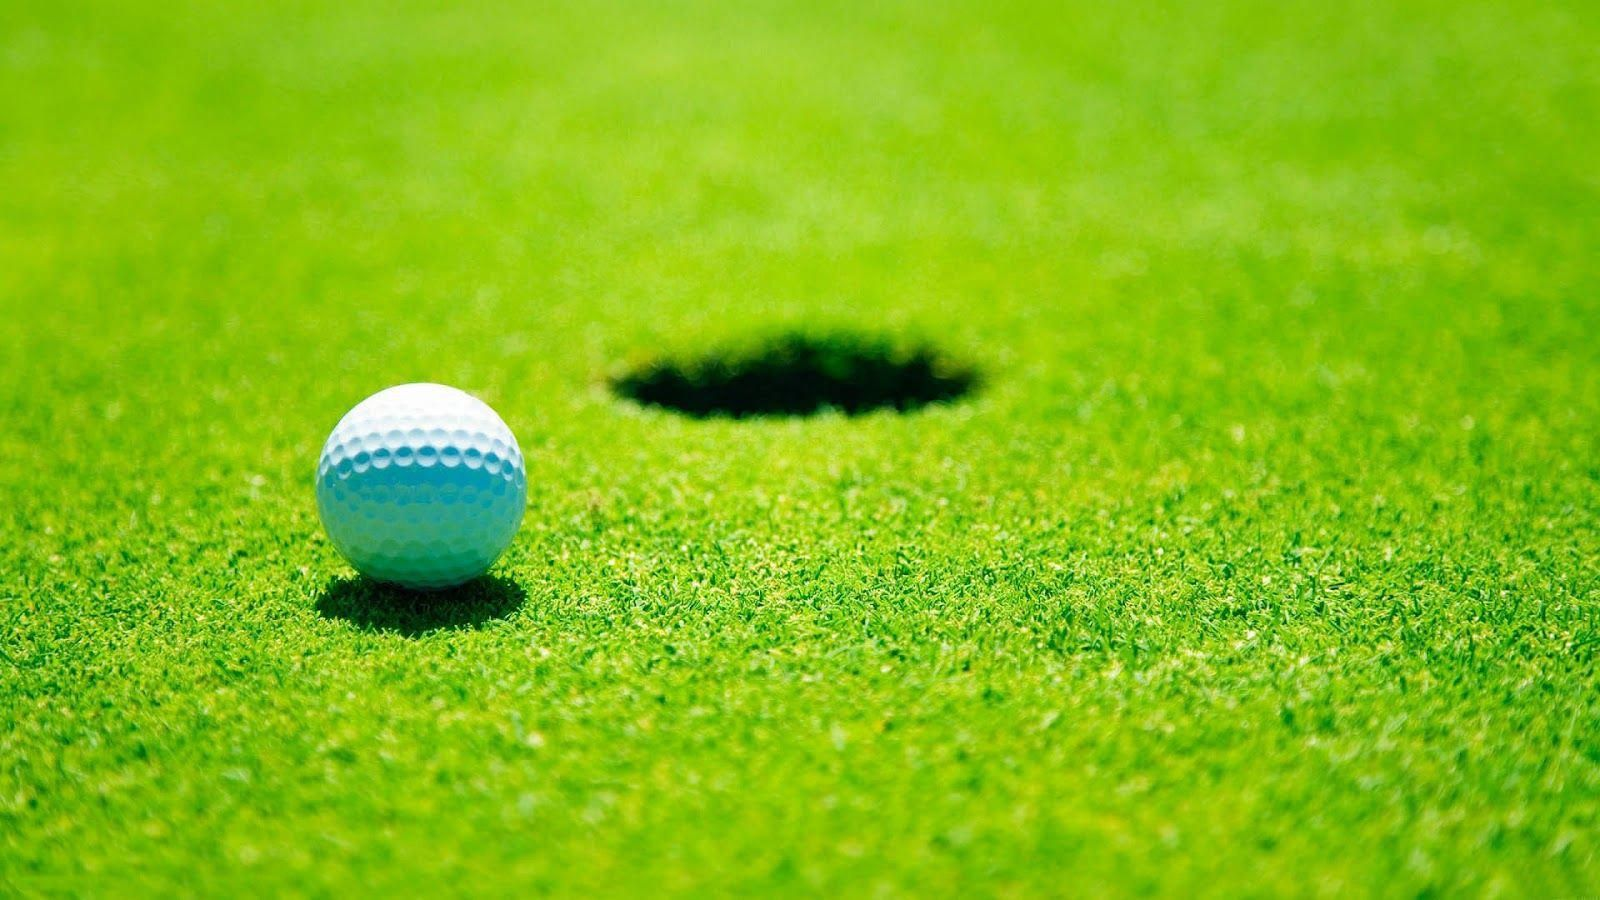 my sports photo album golfcardgame Golf school, Golf